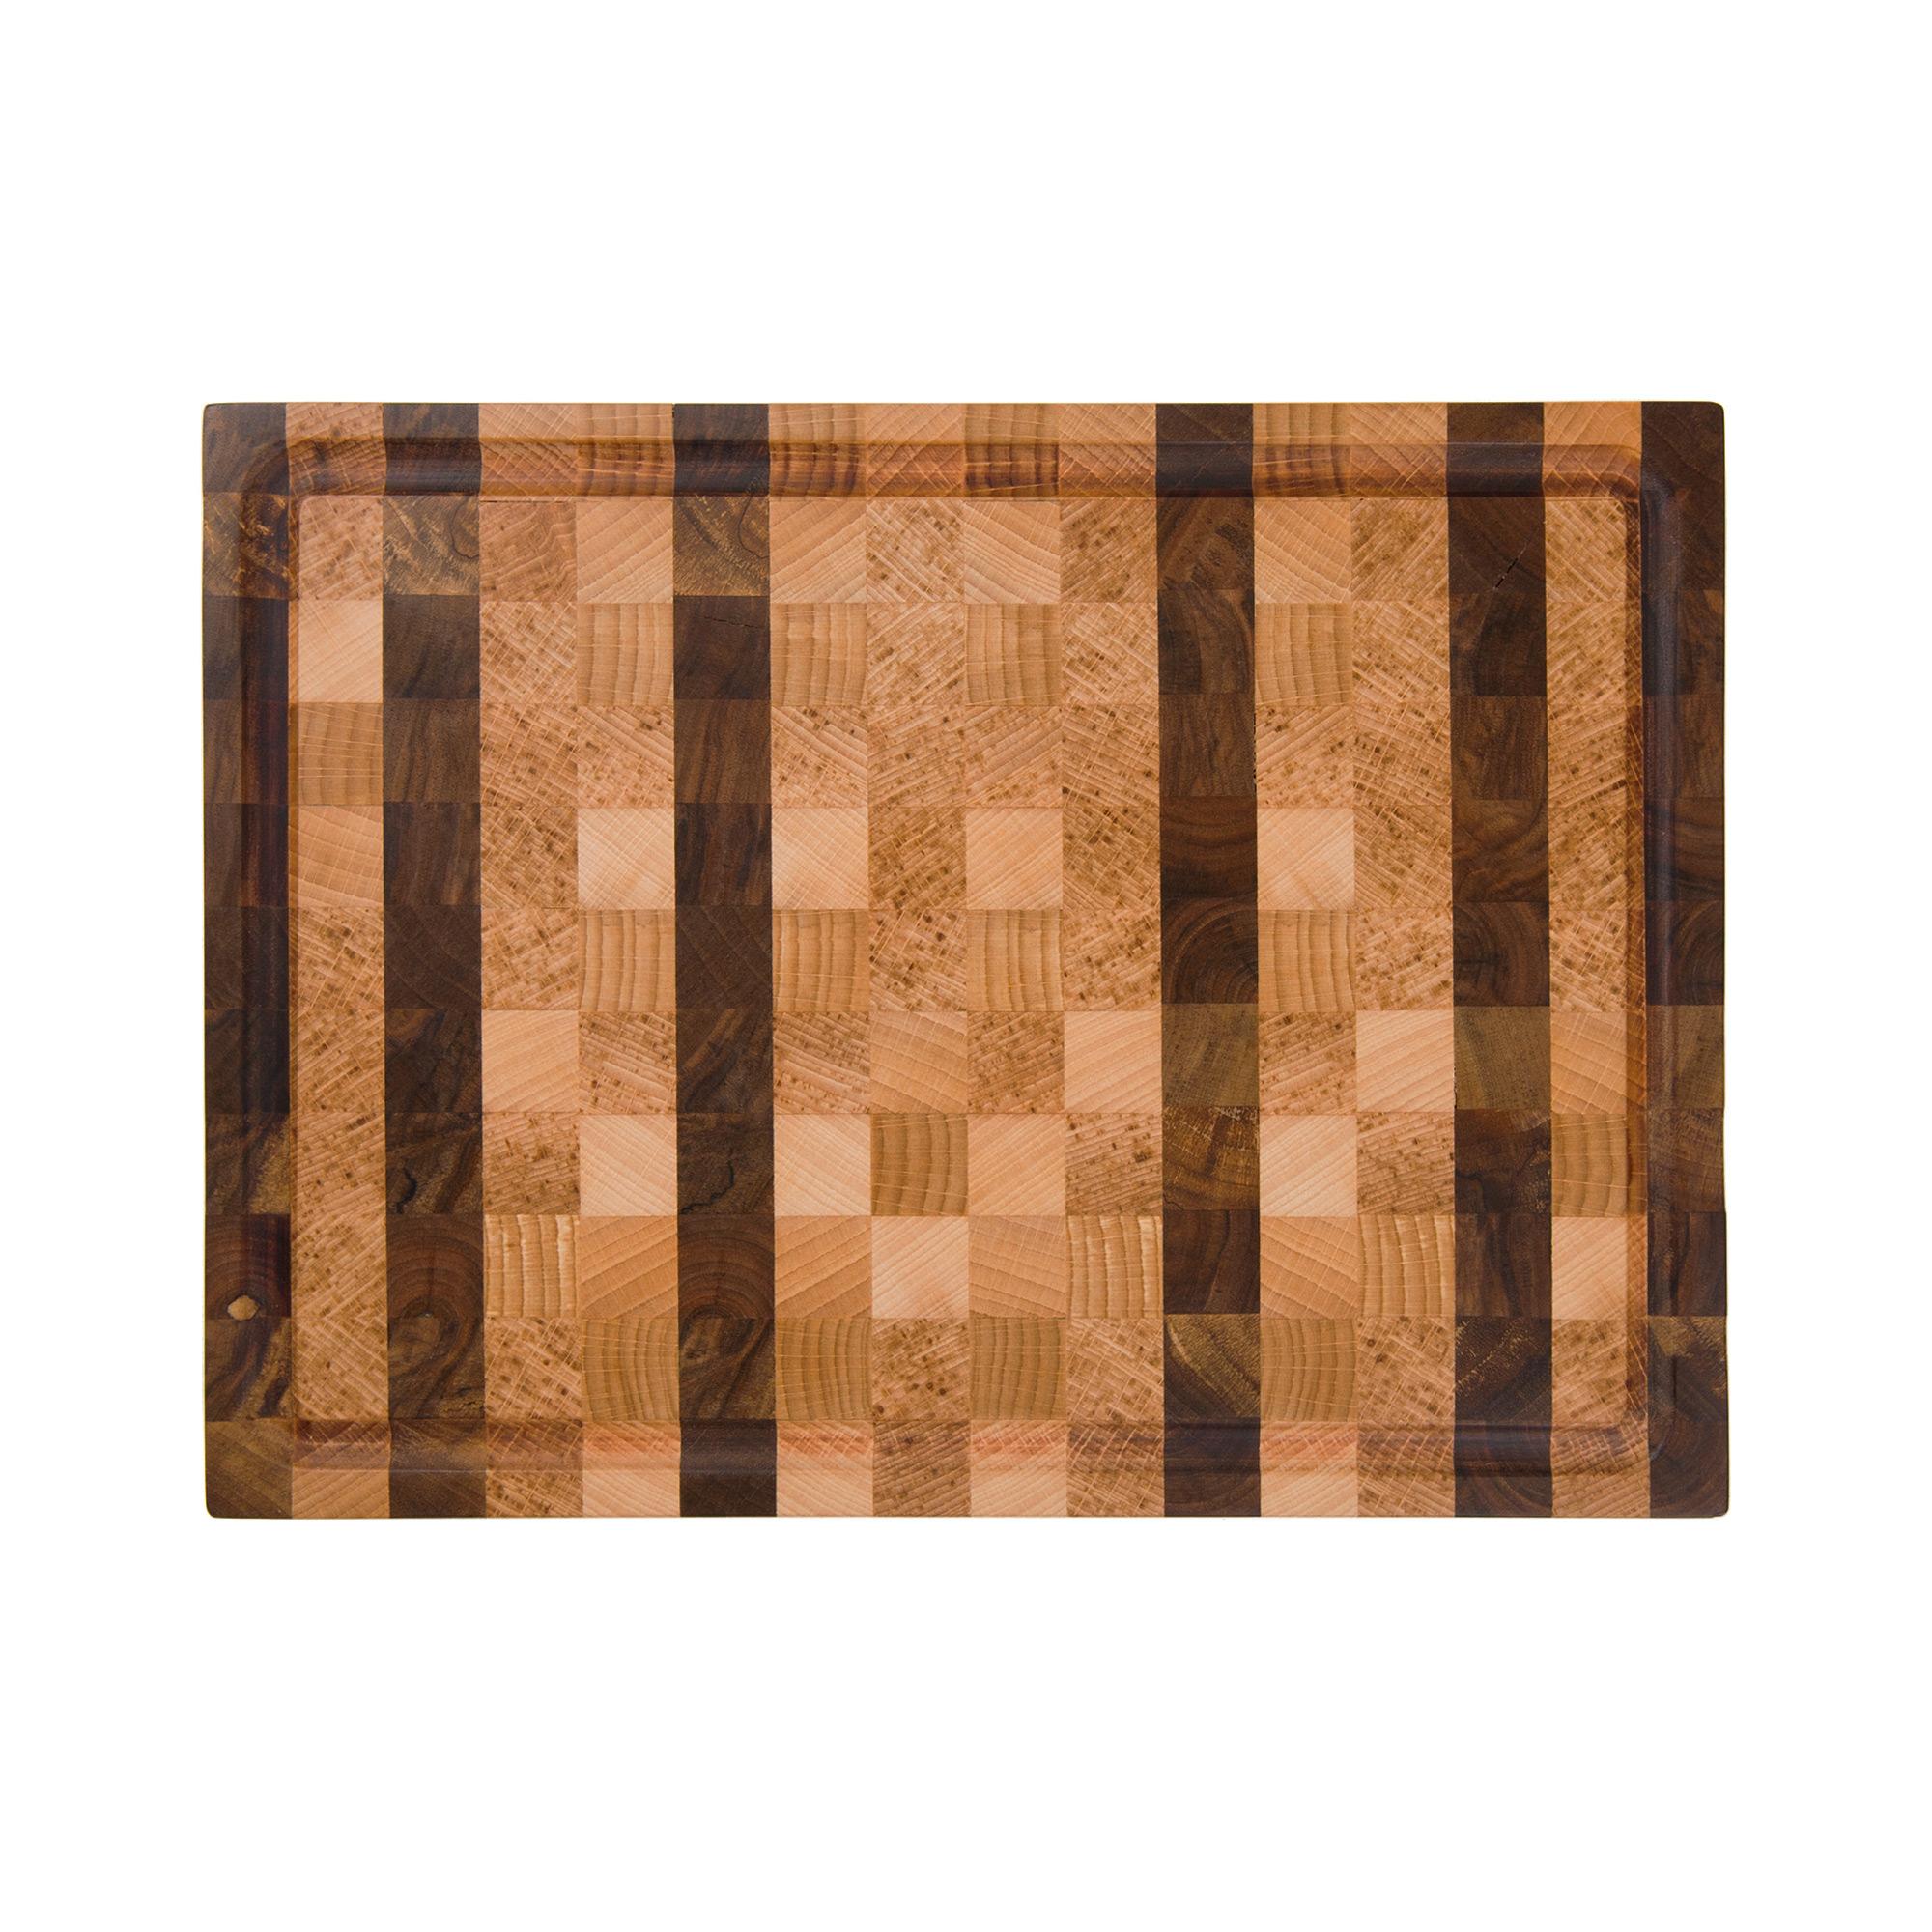 planche-a-decouper-bois-massif-billot-DSC_2387-mon-julo